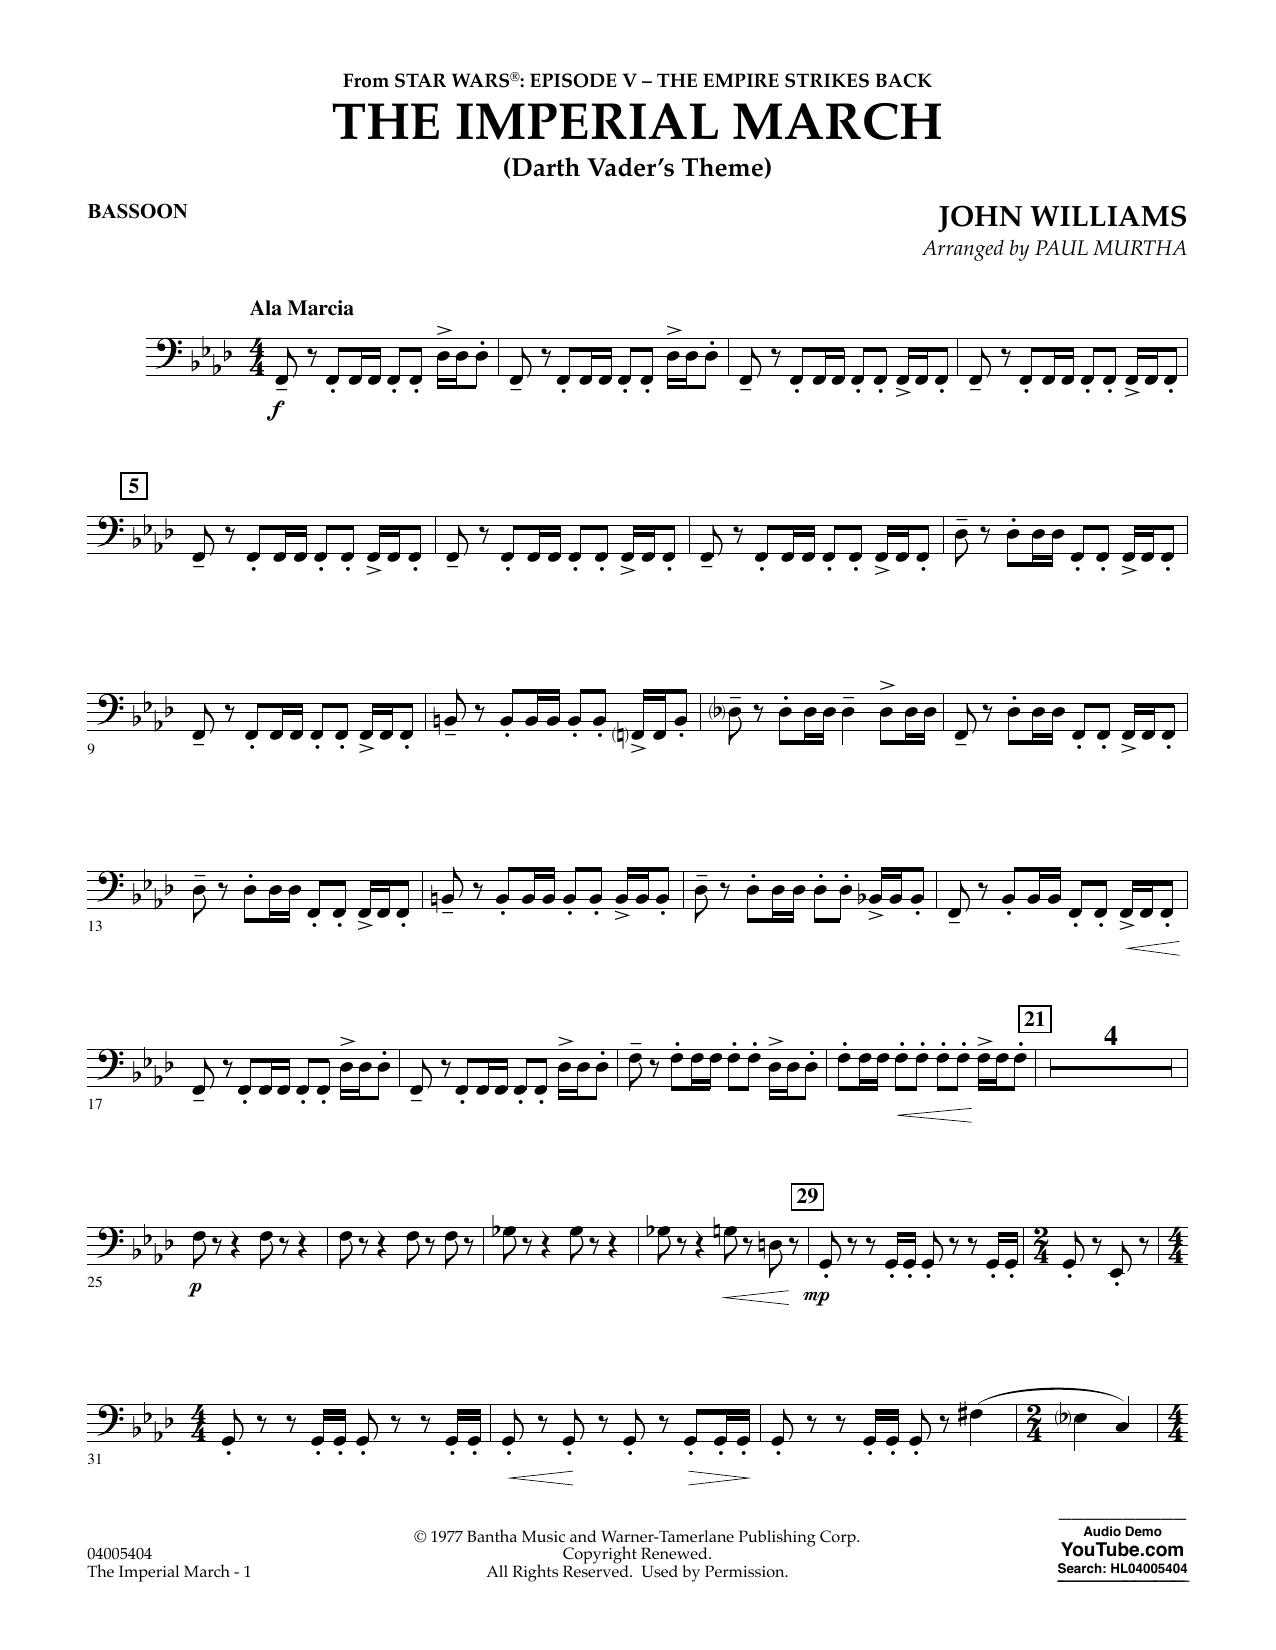 Partition autre The Imperial March (Darth Vader's Theme) - Bassoon de Paul Murtha - Orchestre d'harmonie